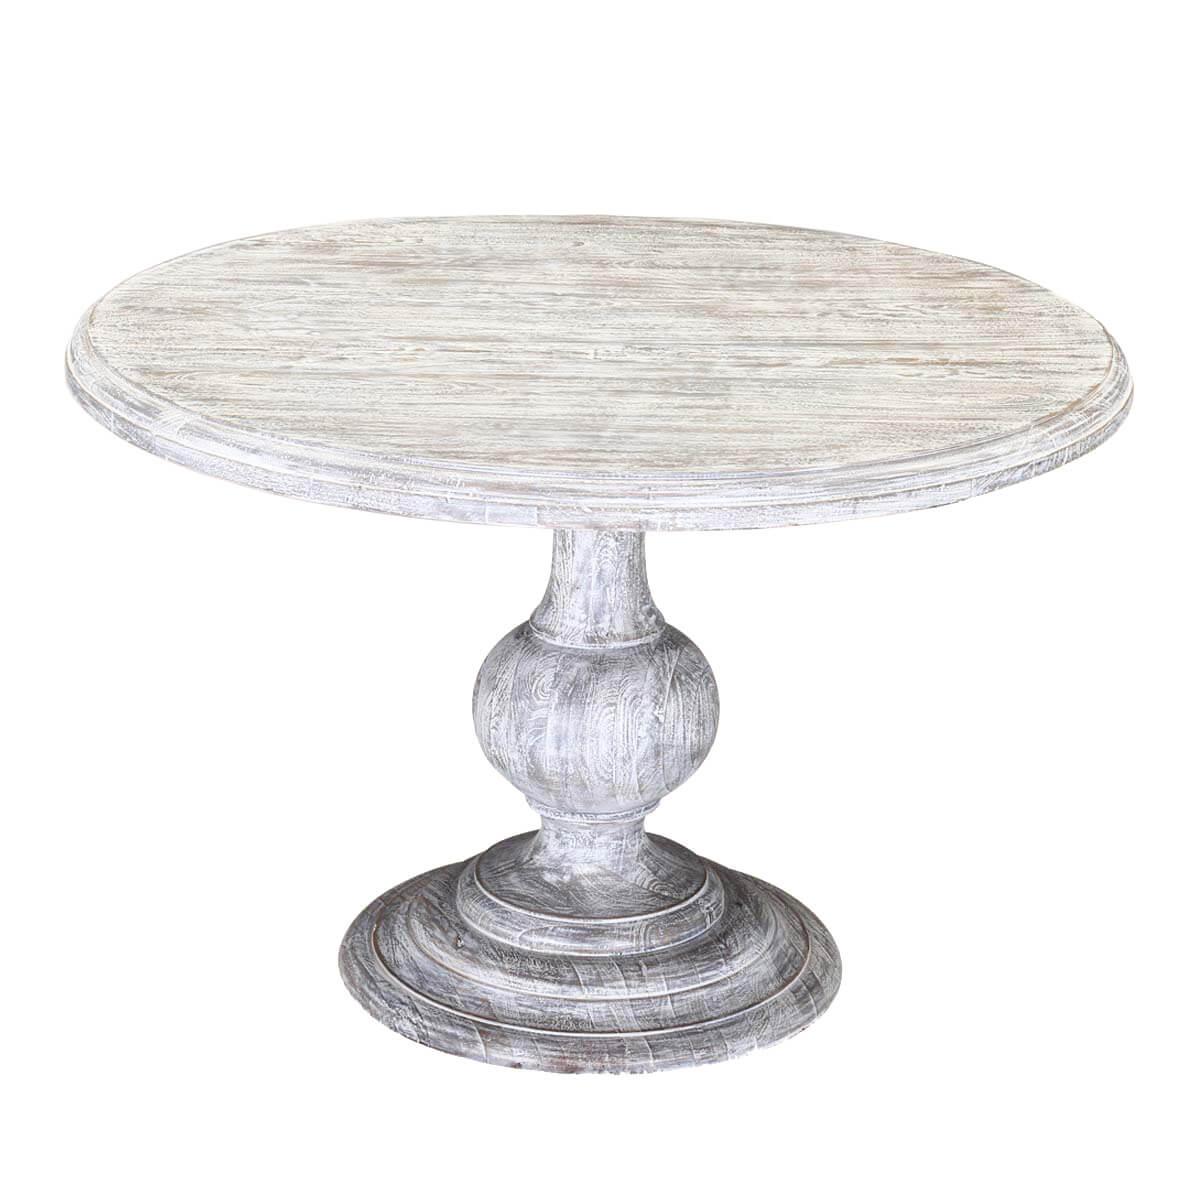 "Winter White Mango Wood 48"" Round Pedestal Dining Table Pertaining To 2018 Tabor 48'' Pedestal Dining Tables (View 12 of 15)"